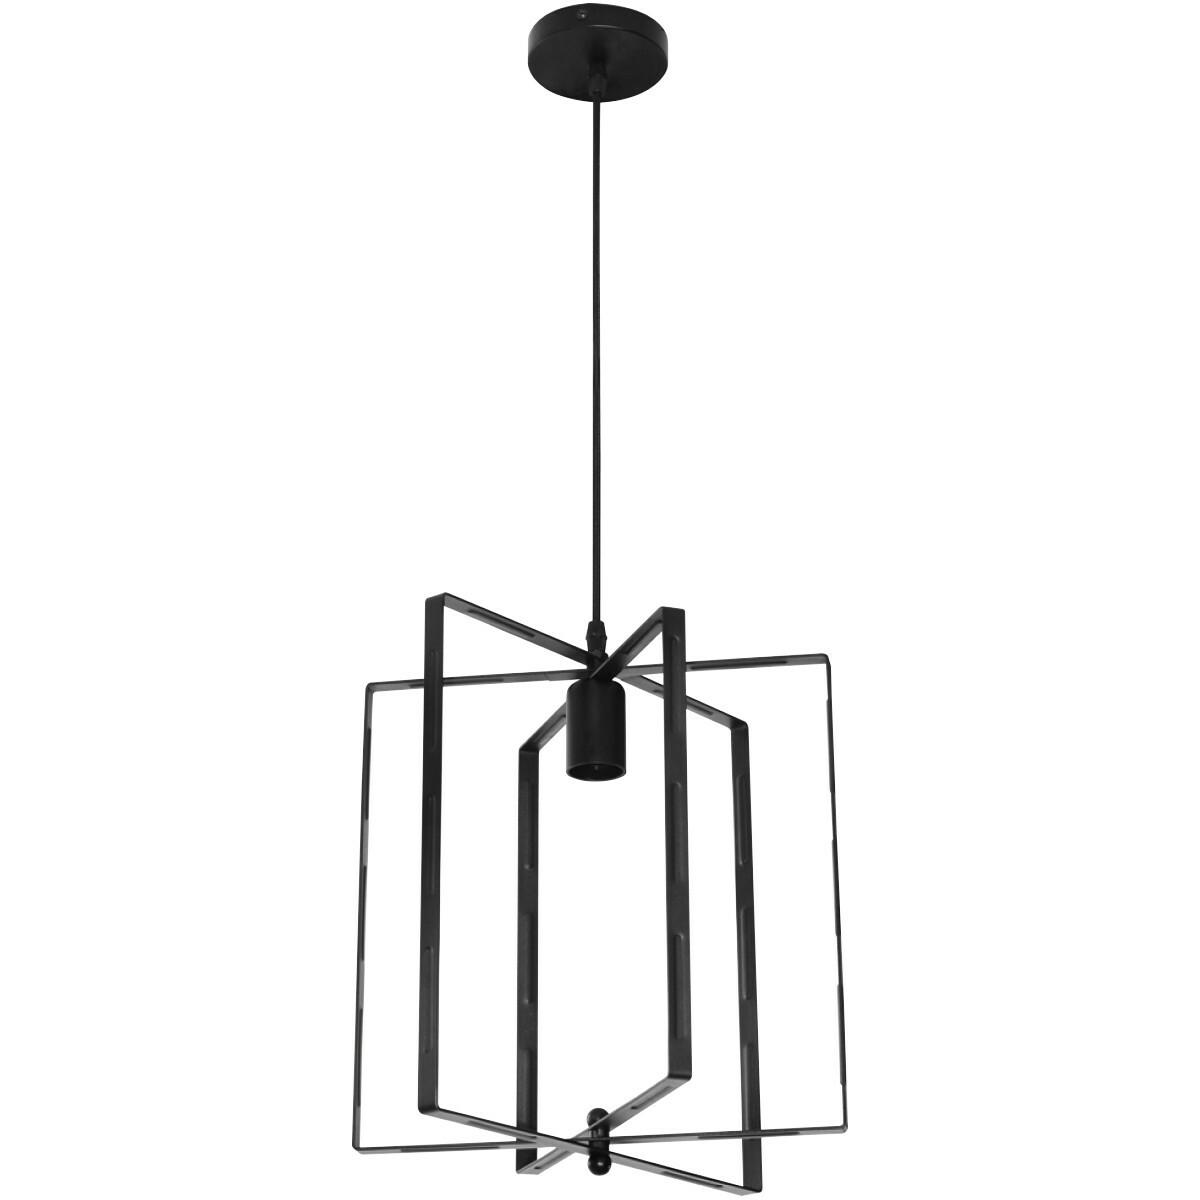 PHILIPS - LED Hanglamp - CorePro LEDbulb 827 A60 - Noby Industrieel - E27 Fitting - 5.5W - Warm Wit